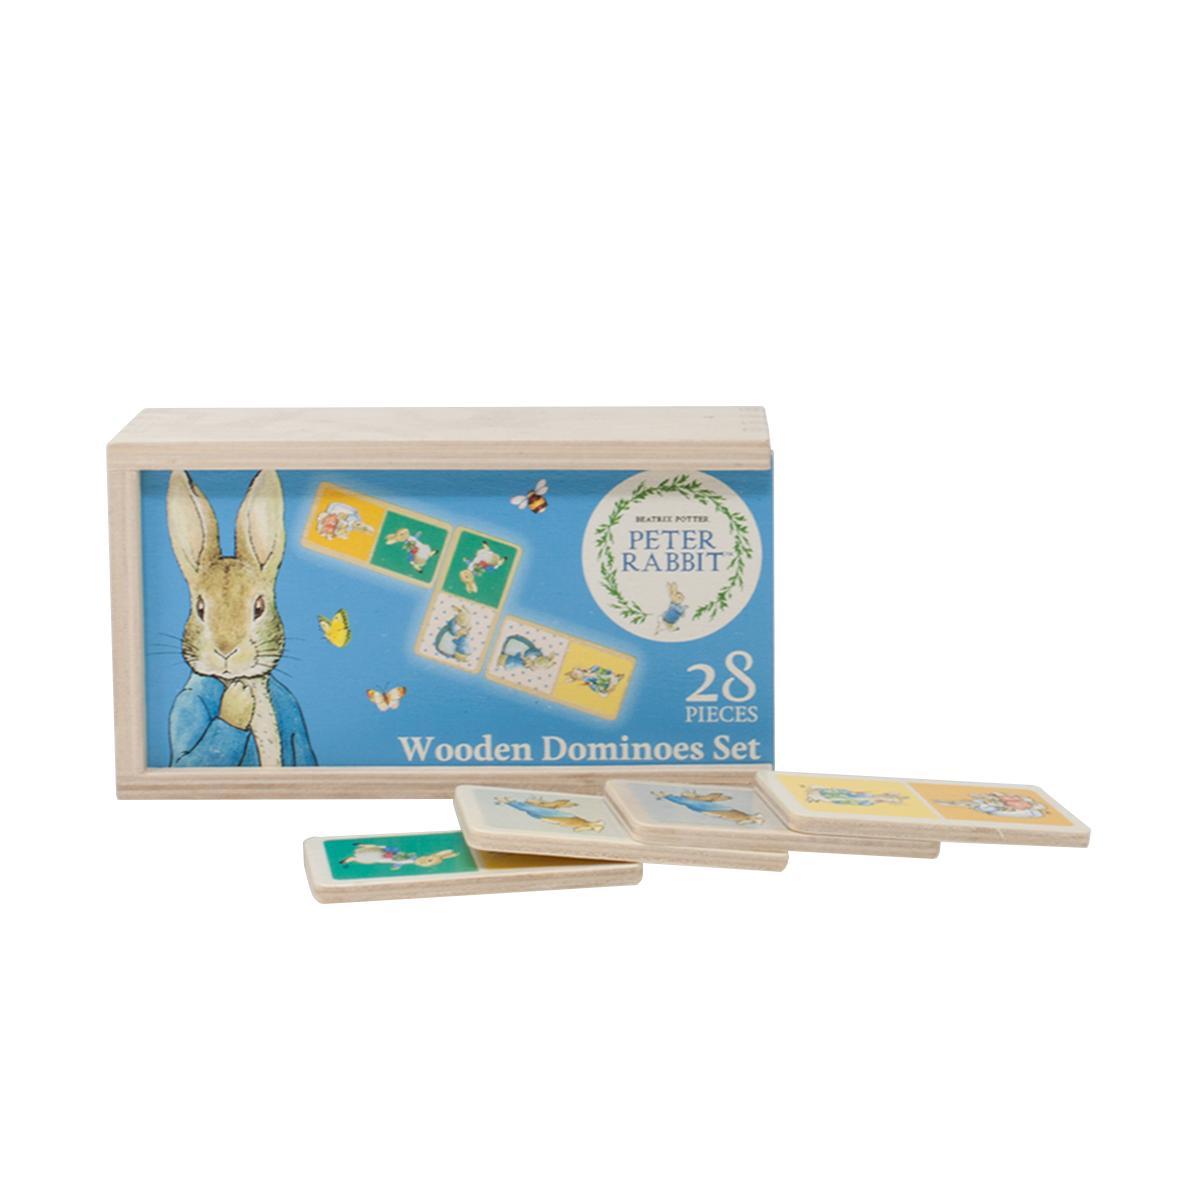 Rainbow Dřevěné domino králička Petra